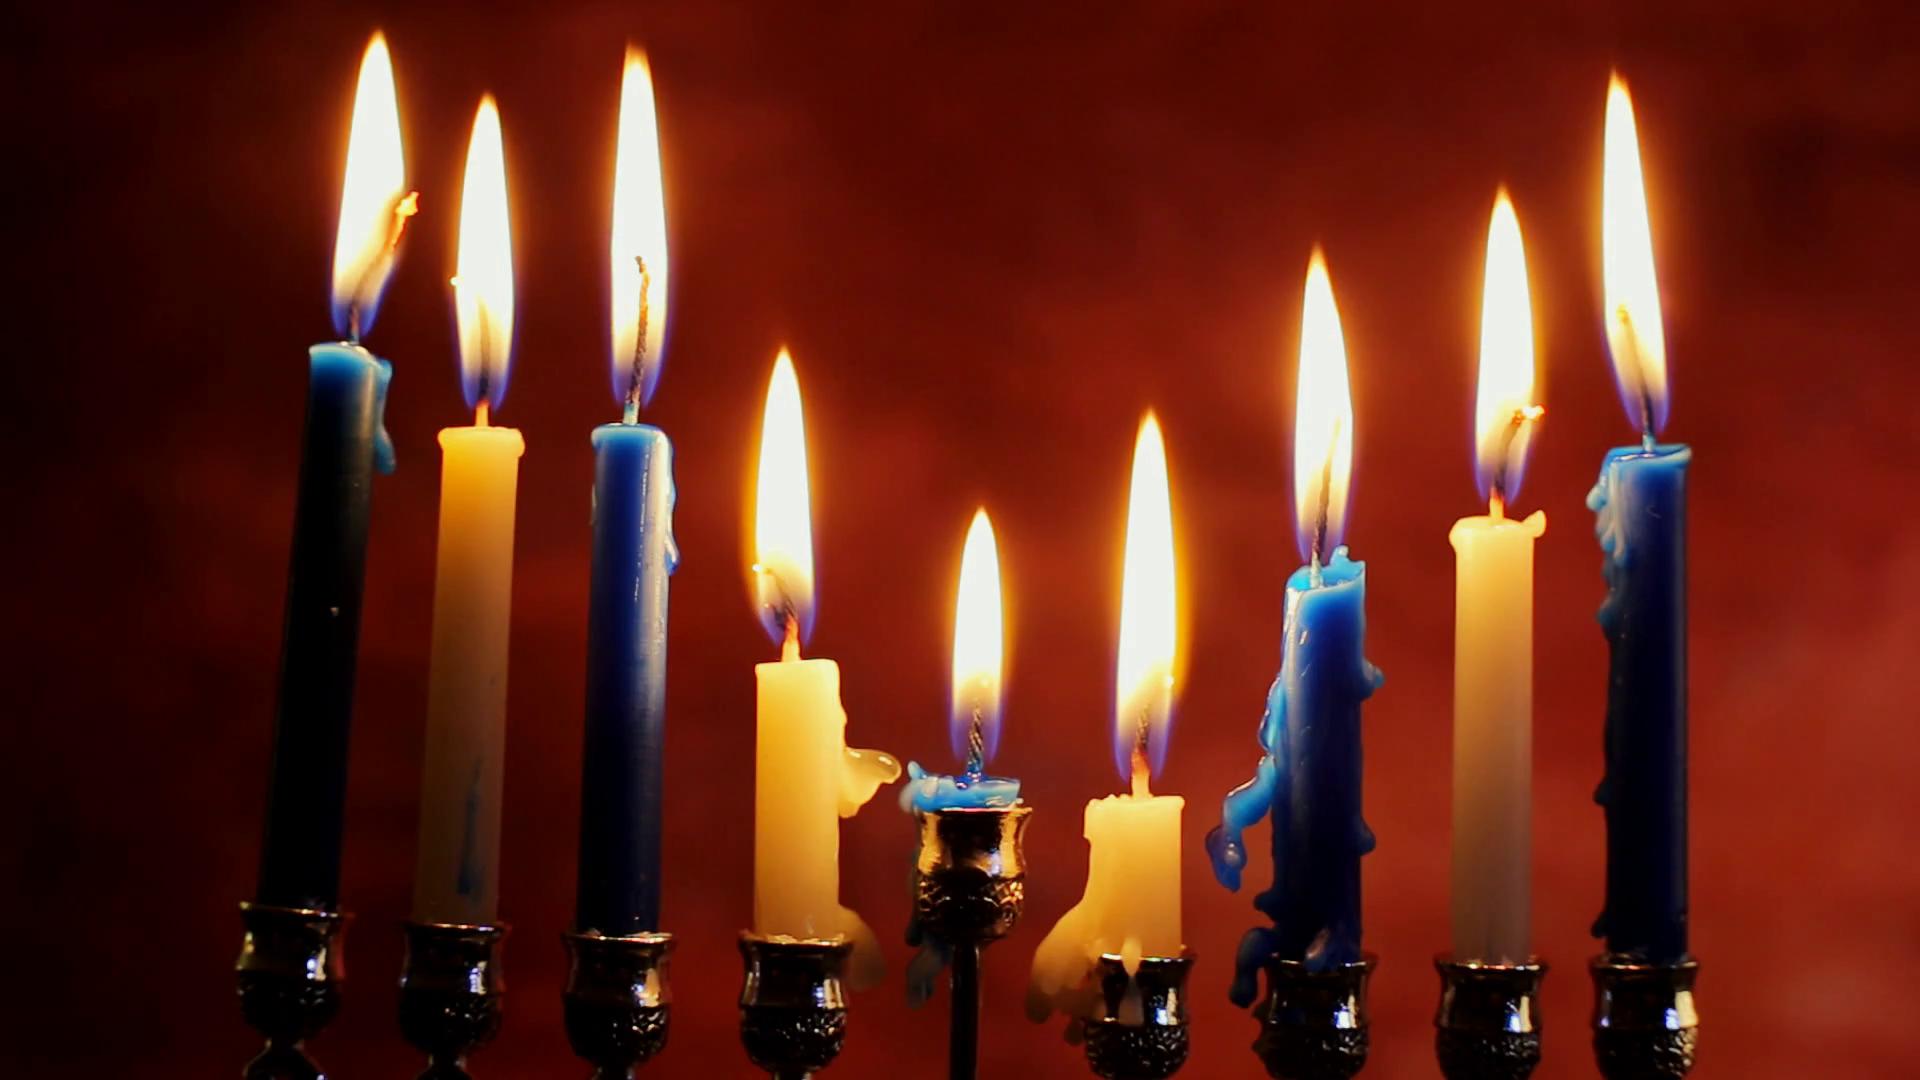 Jewish holiday hannukah symbols Lighting Hanukkah Candles Hanukkah  celebration judaism menorah tradition Stock Video Footage - VideoBlocks - Jewish Holiday HD PNG